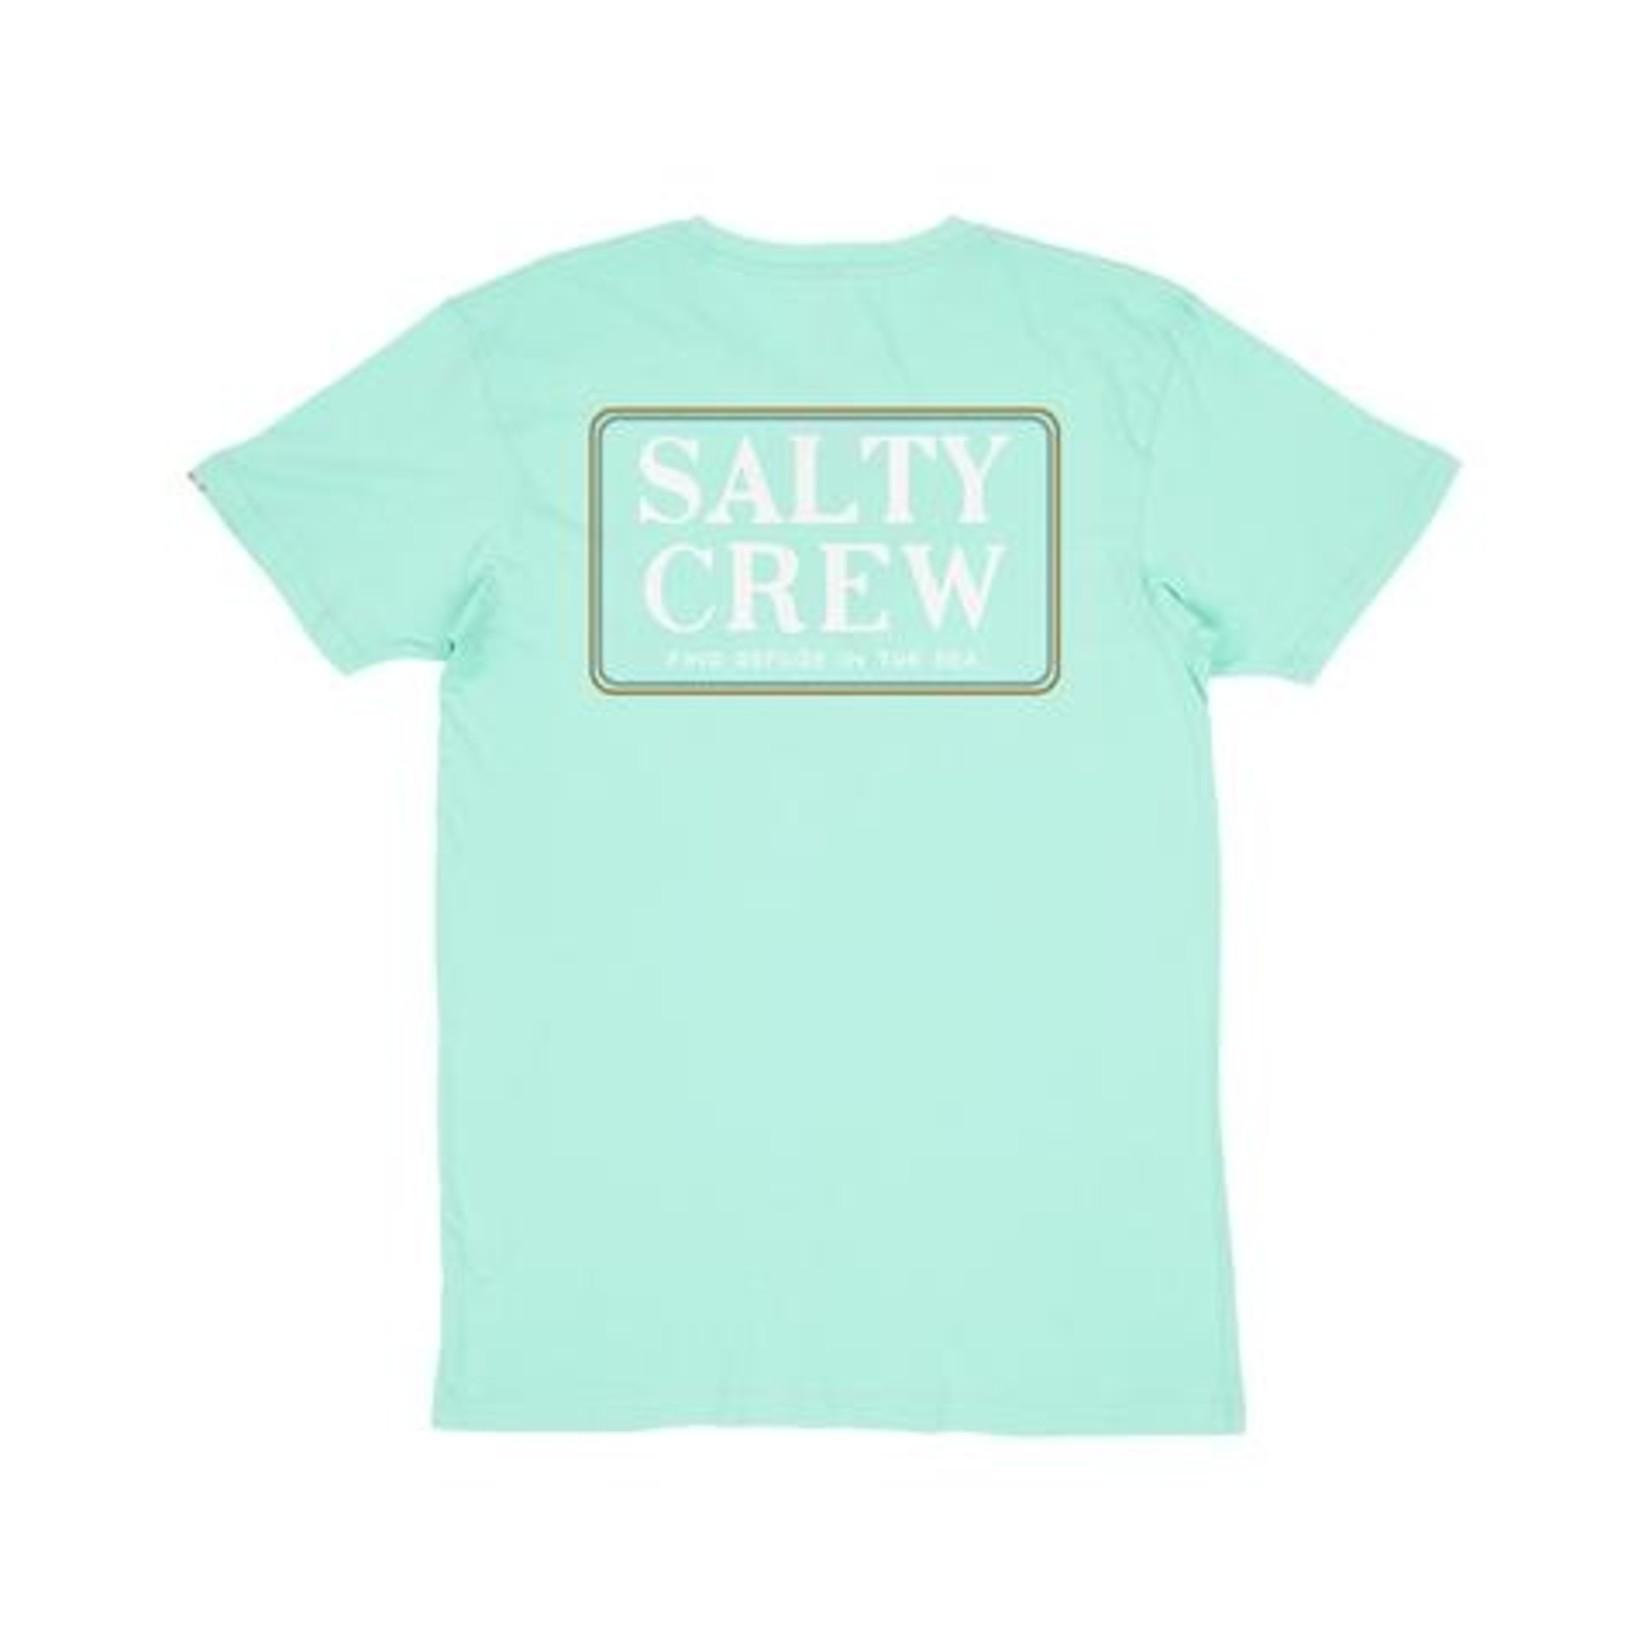 Salty Crew Deckhand Tee